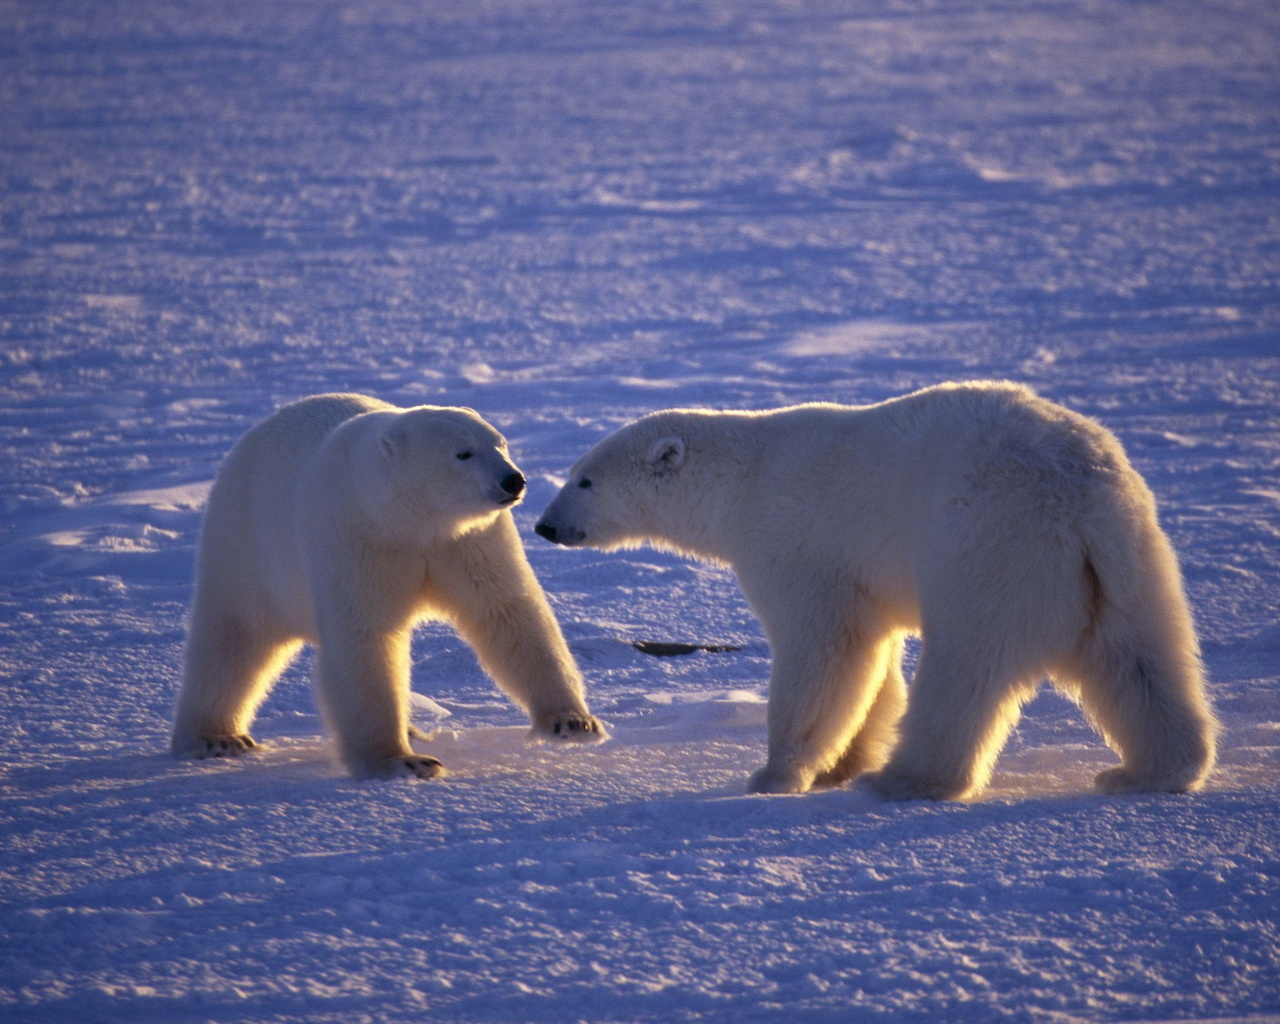 North pole animals pictures Arctic Animal Printouts - m